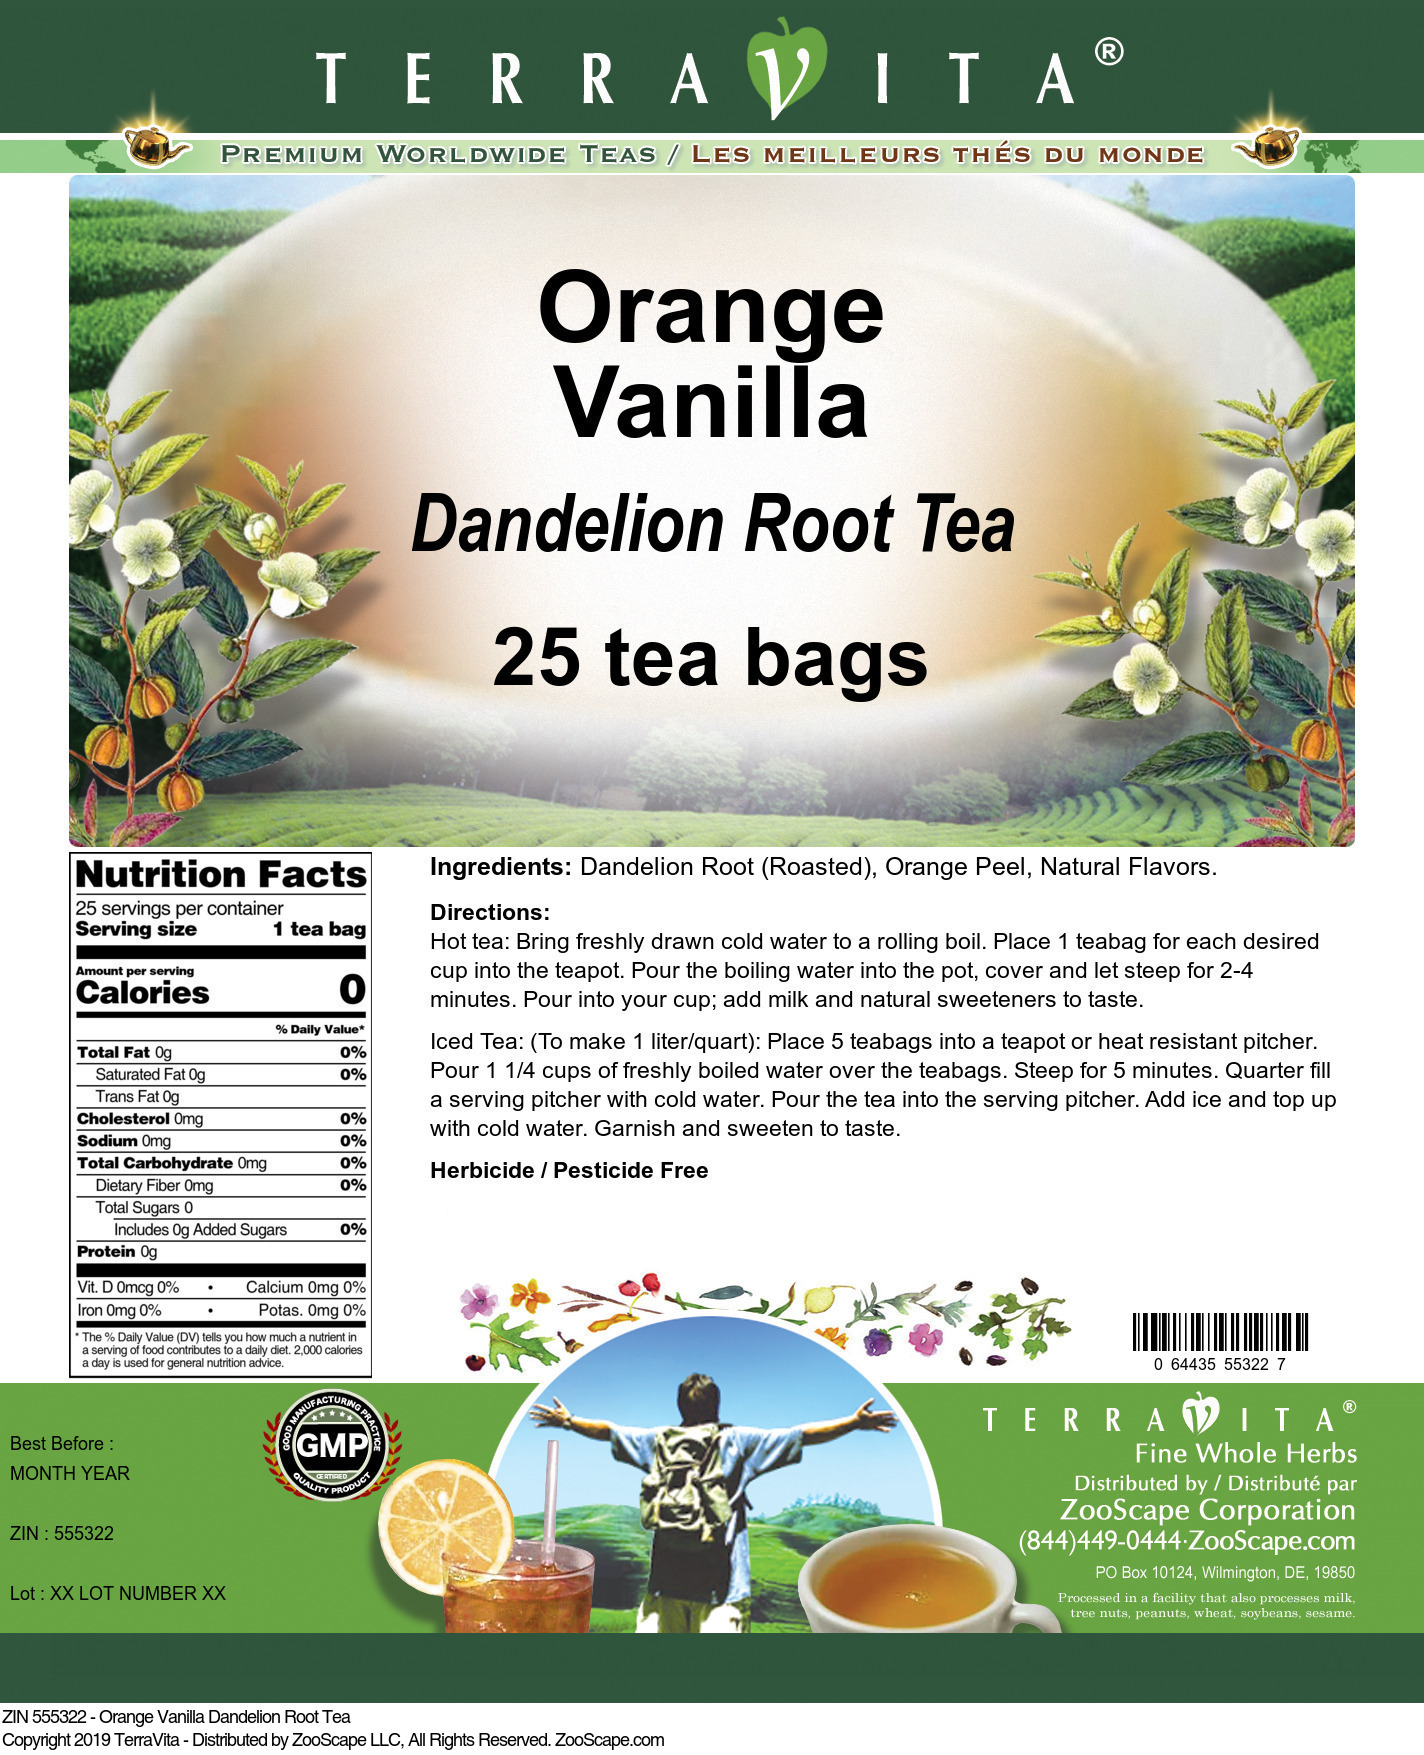 Orange Vanilla Dandelion Root